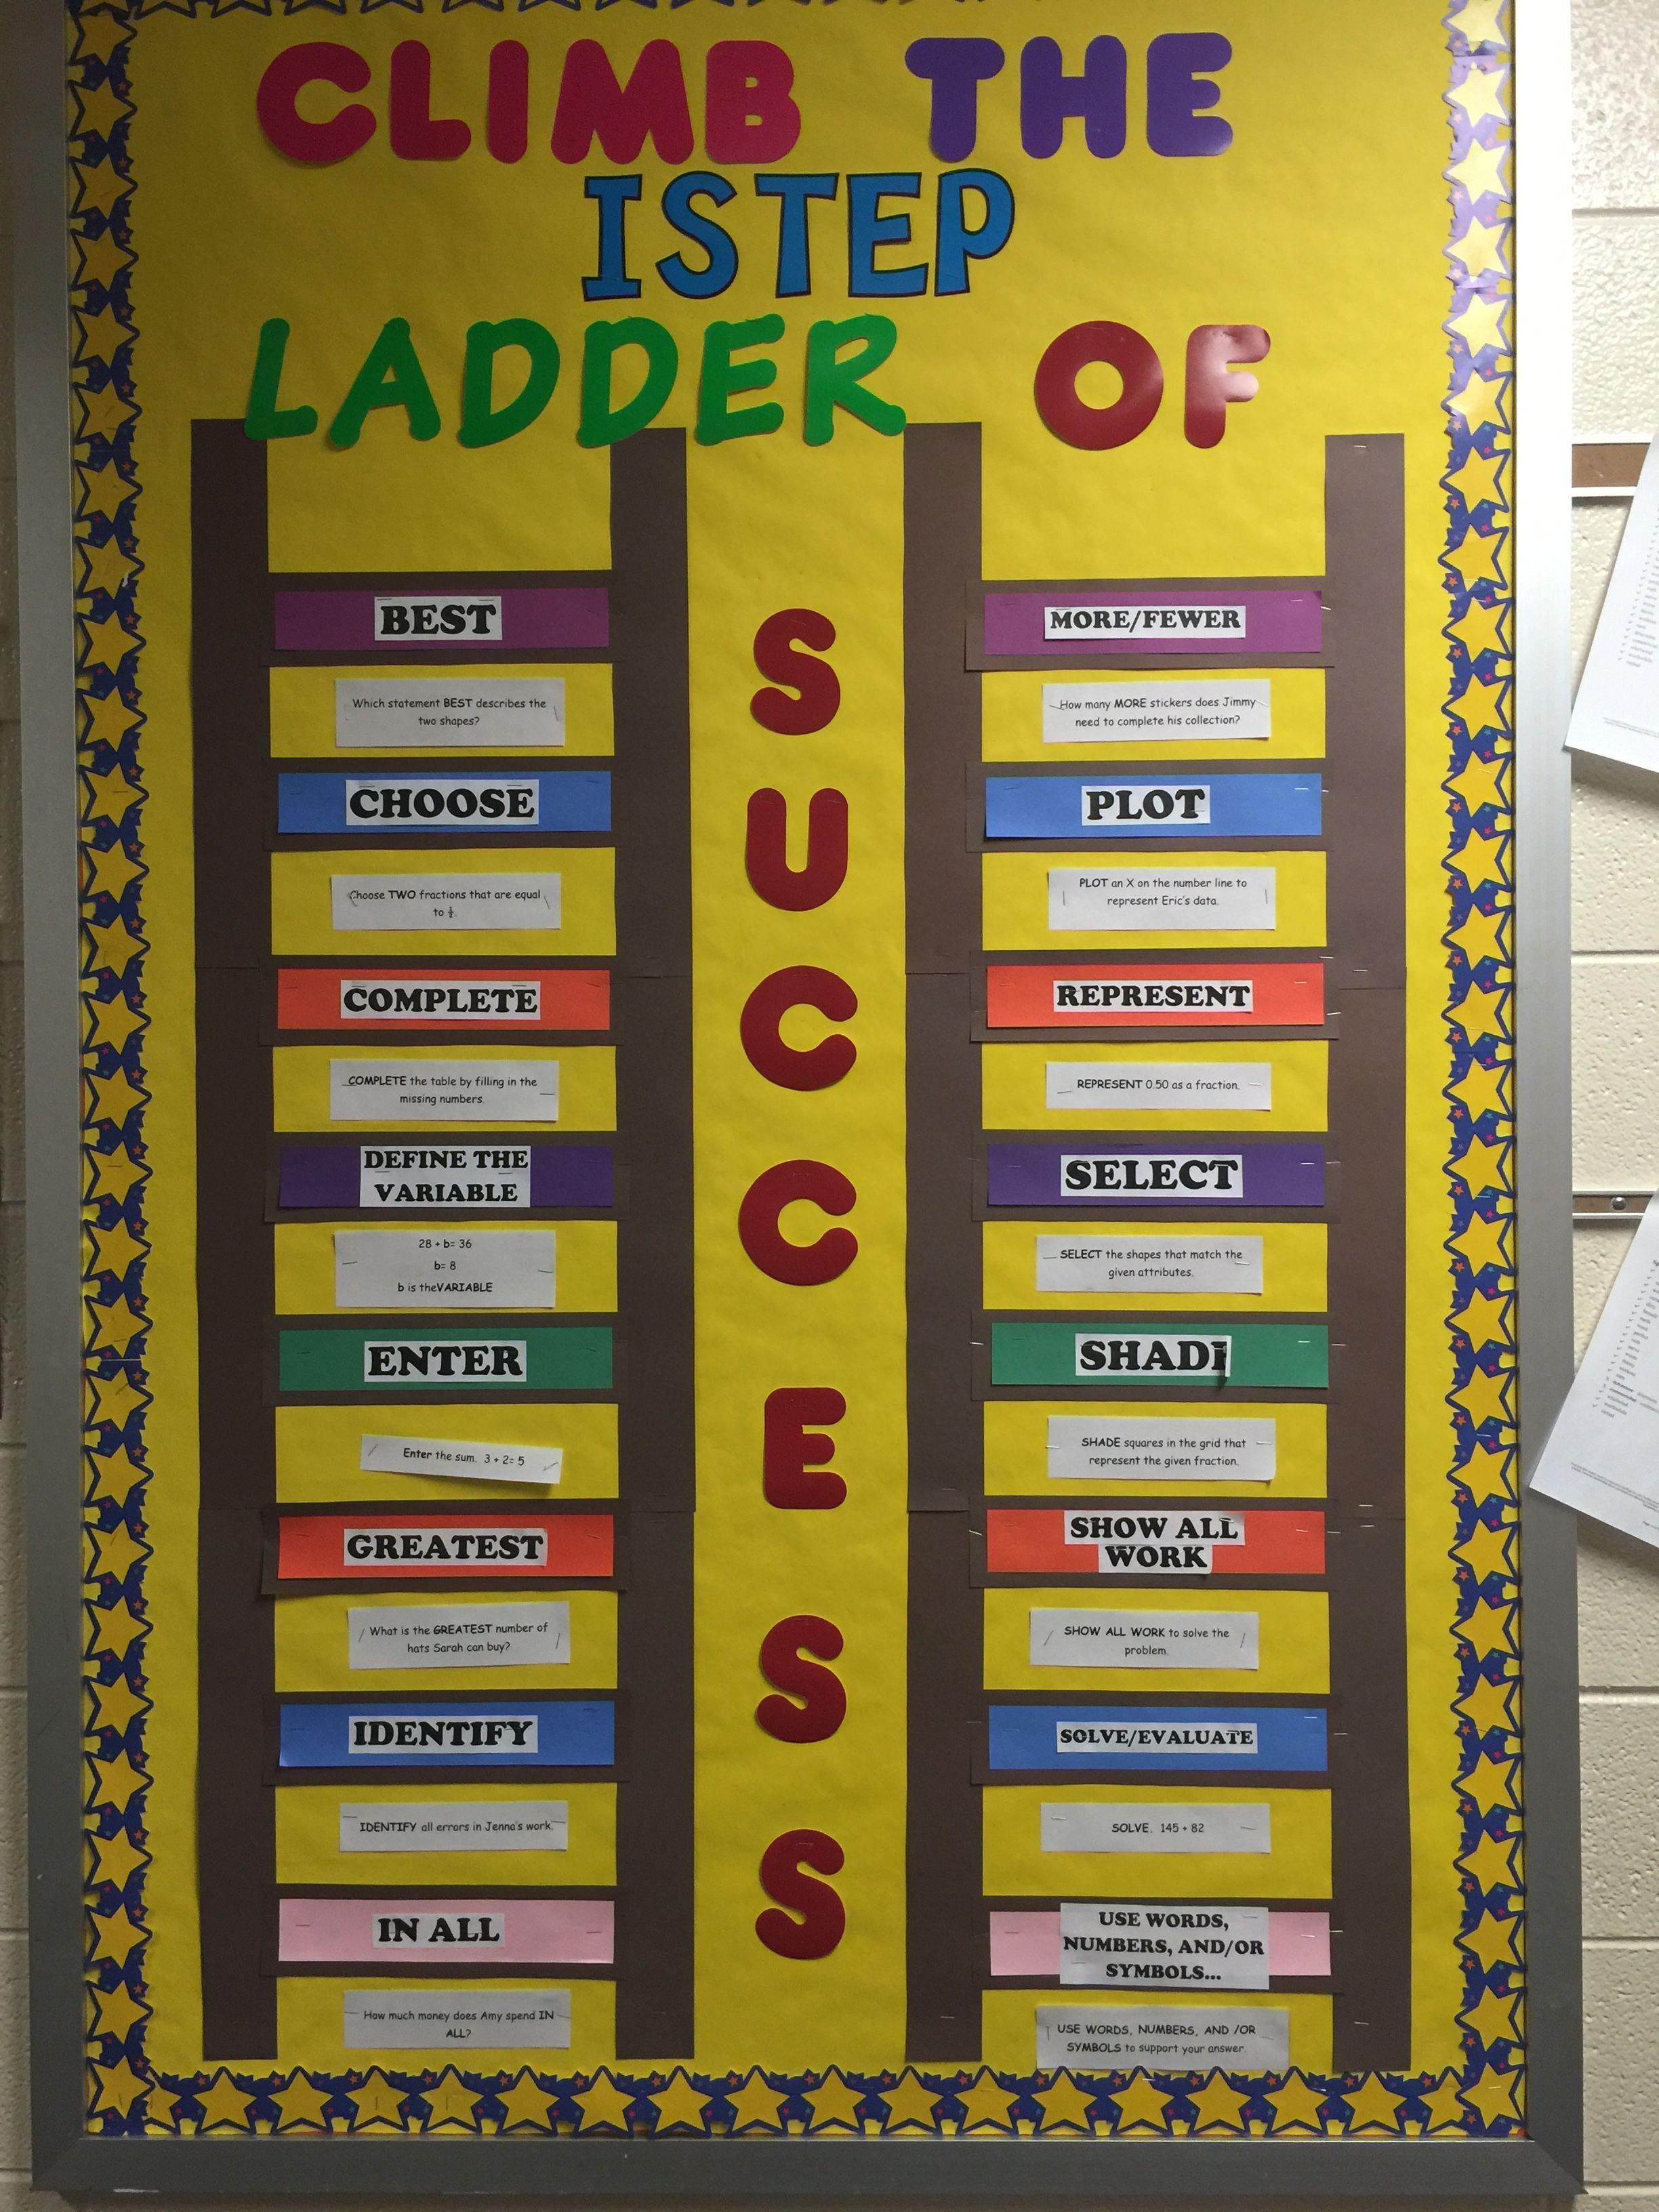 Climb The Istep Ladder Of Success